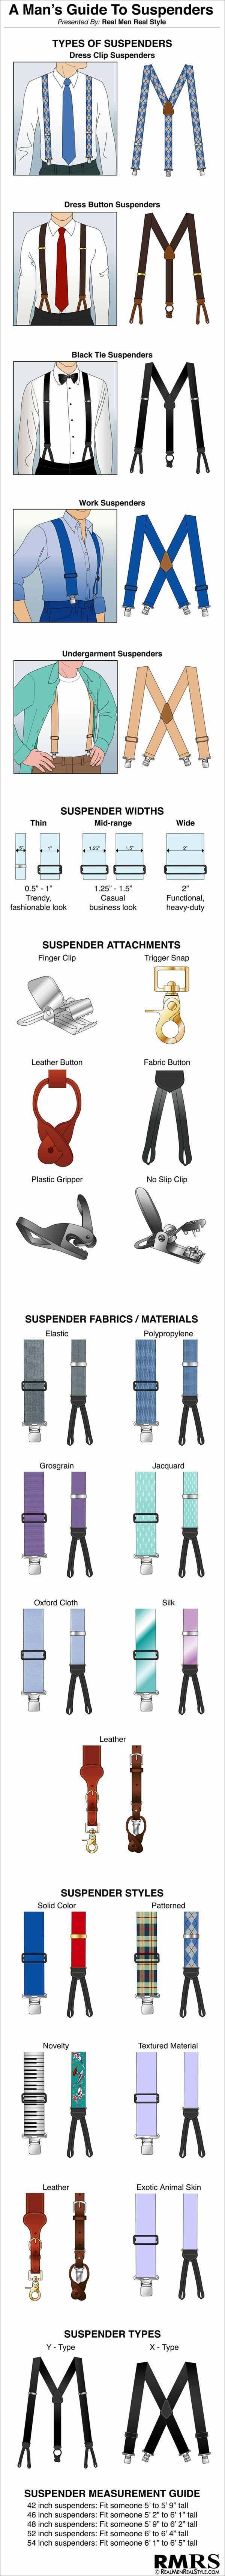 A Man's Guide To Suspenders | Trouser Braces Infographic | Suspender Guide (via @antoniocenteno)